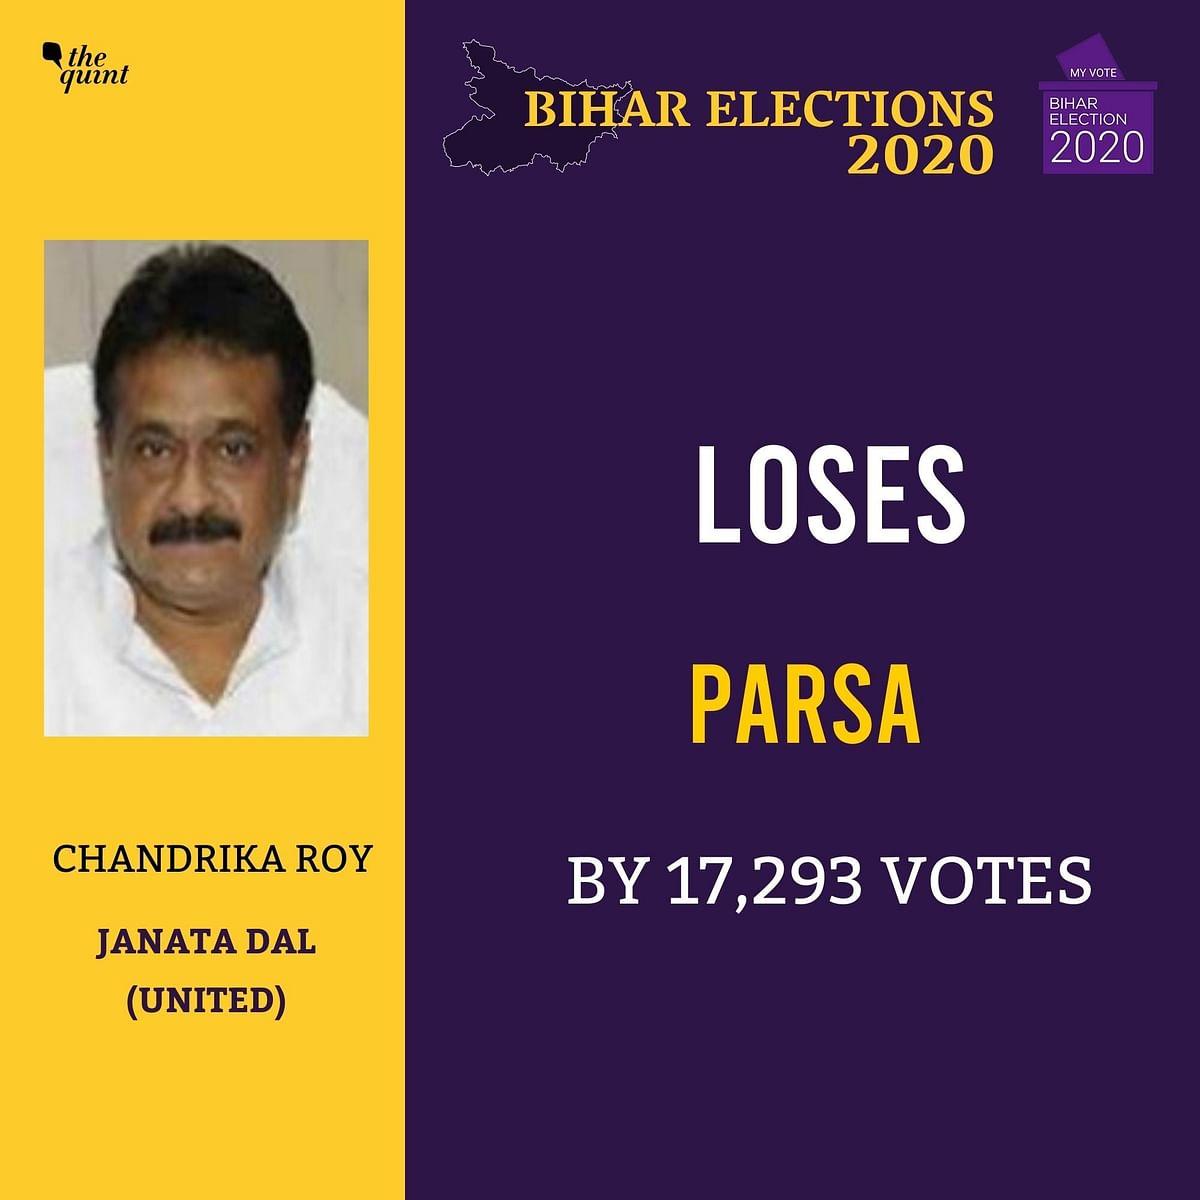 Bihar Polls: Tej Pratap, Tejashwi, Jitan Ram Manjhi Among Winners